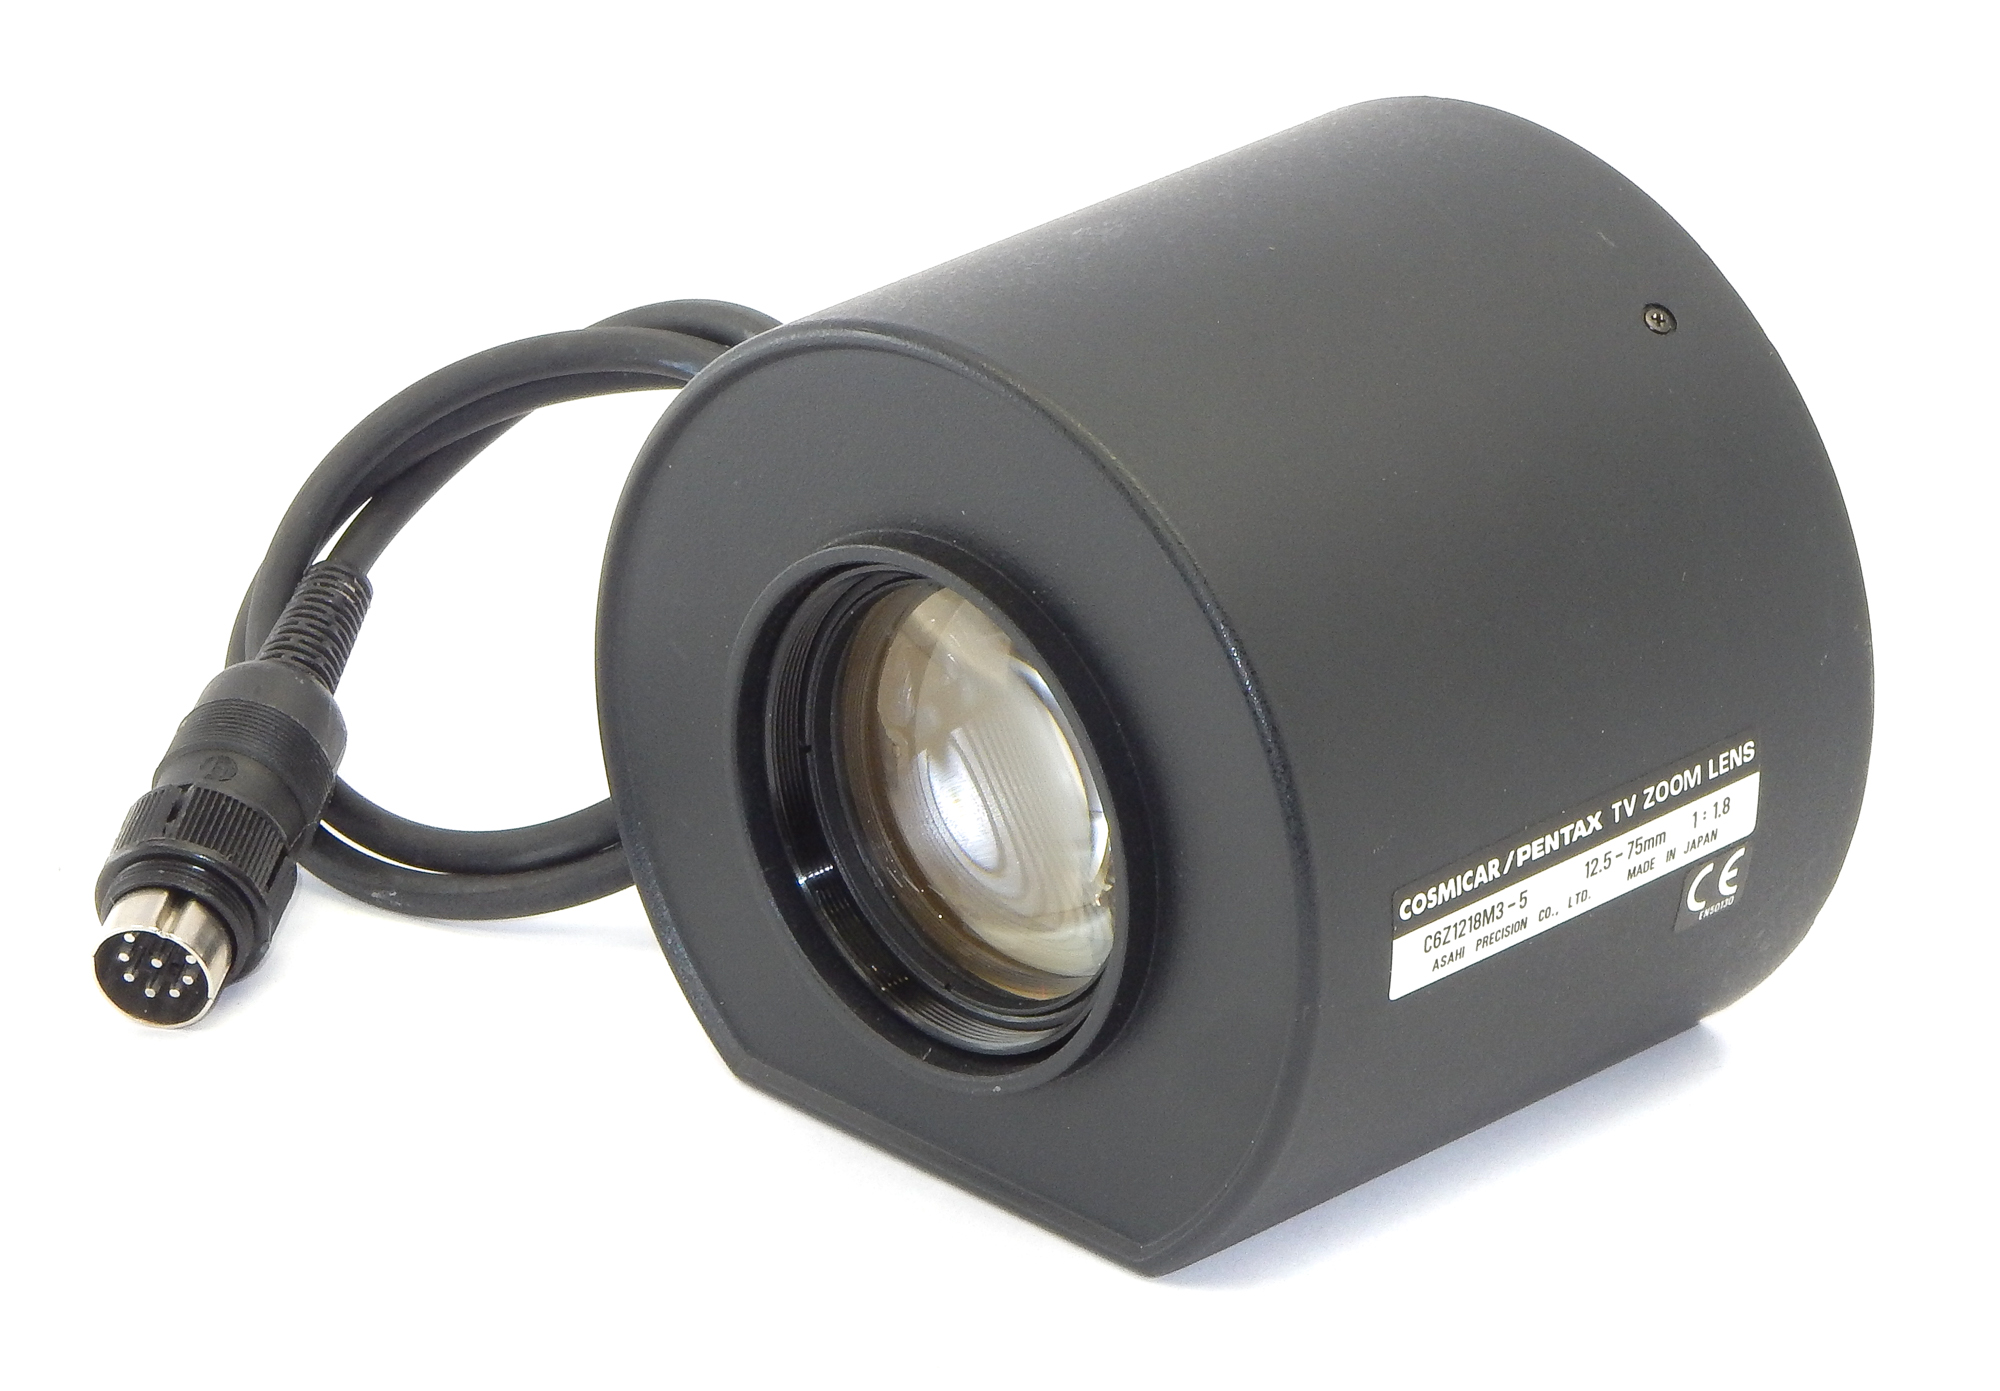 Cosmicar / Pentax C6Z1218M3-5 TV Zoom Lens 12.5-75MM 1:1.8